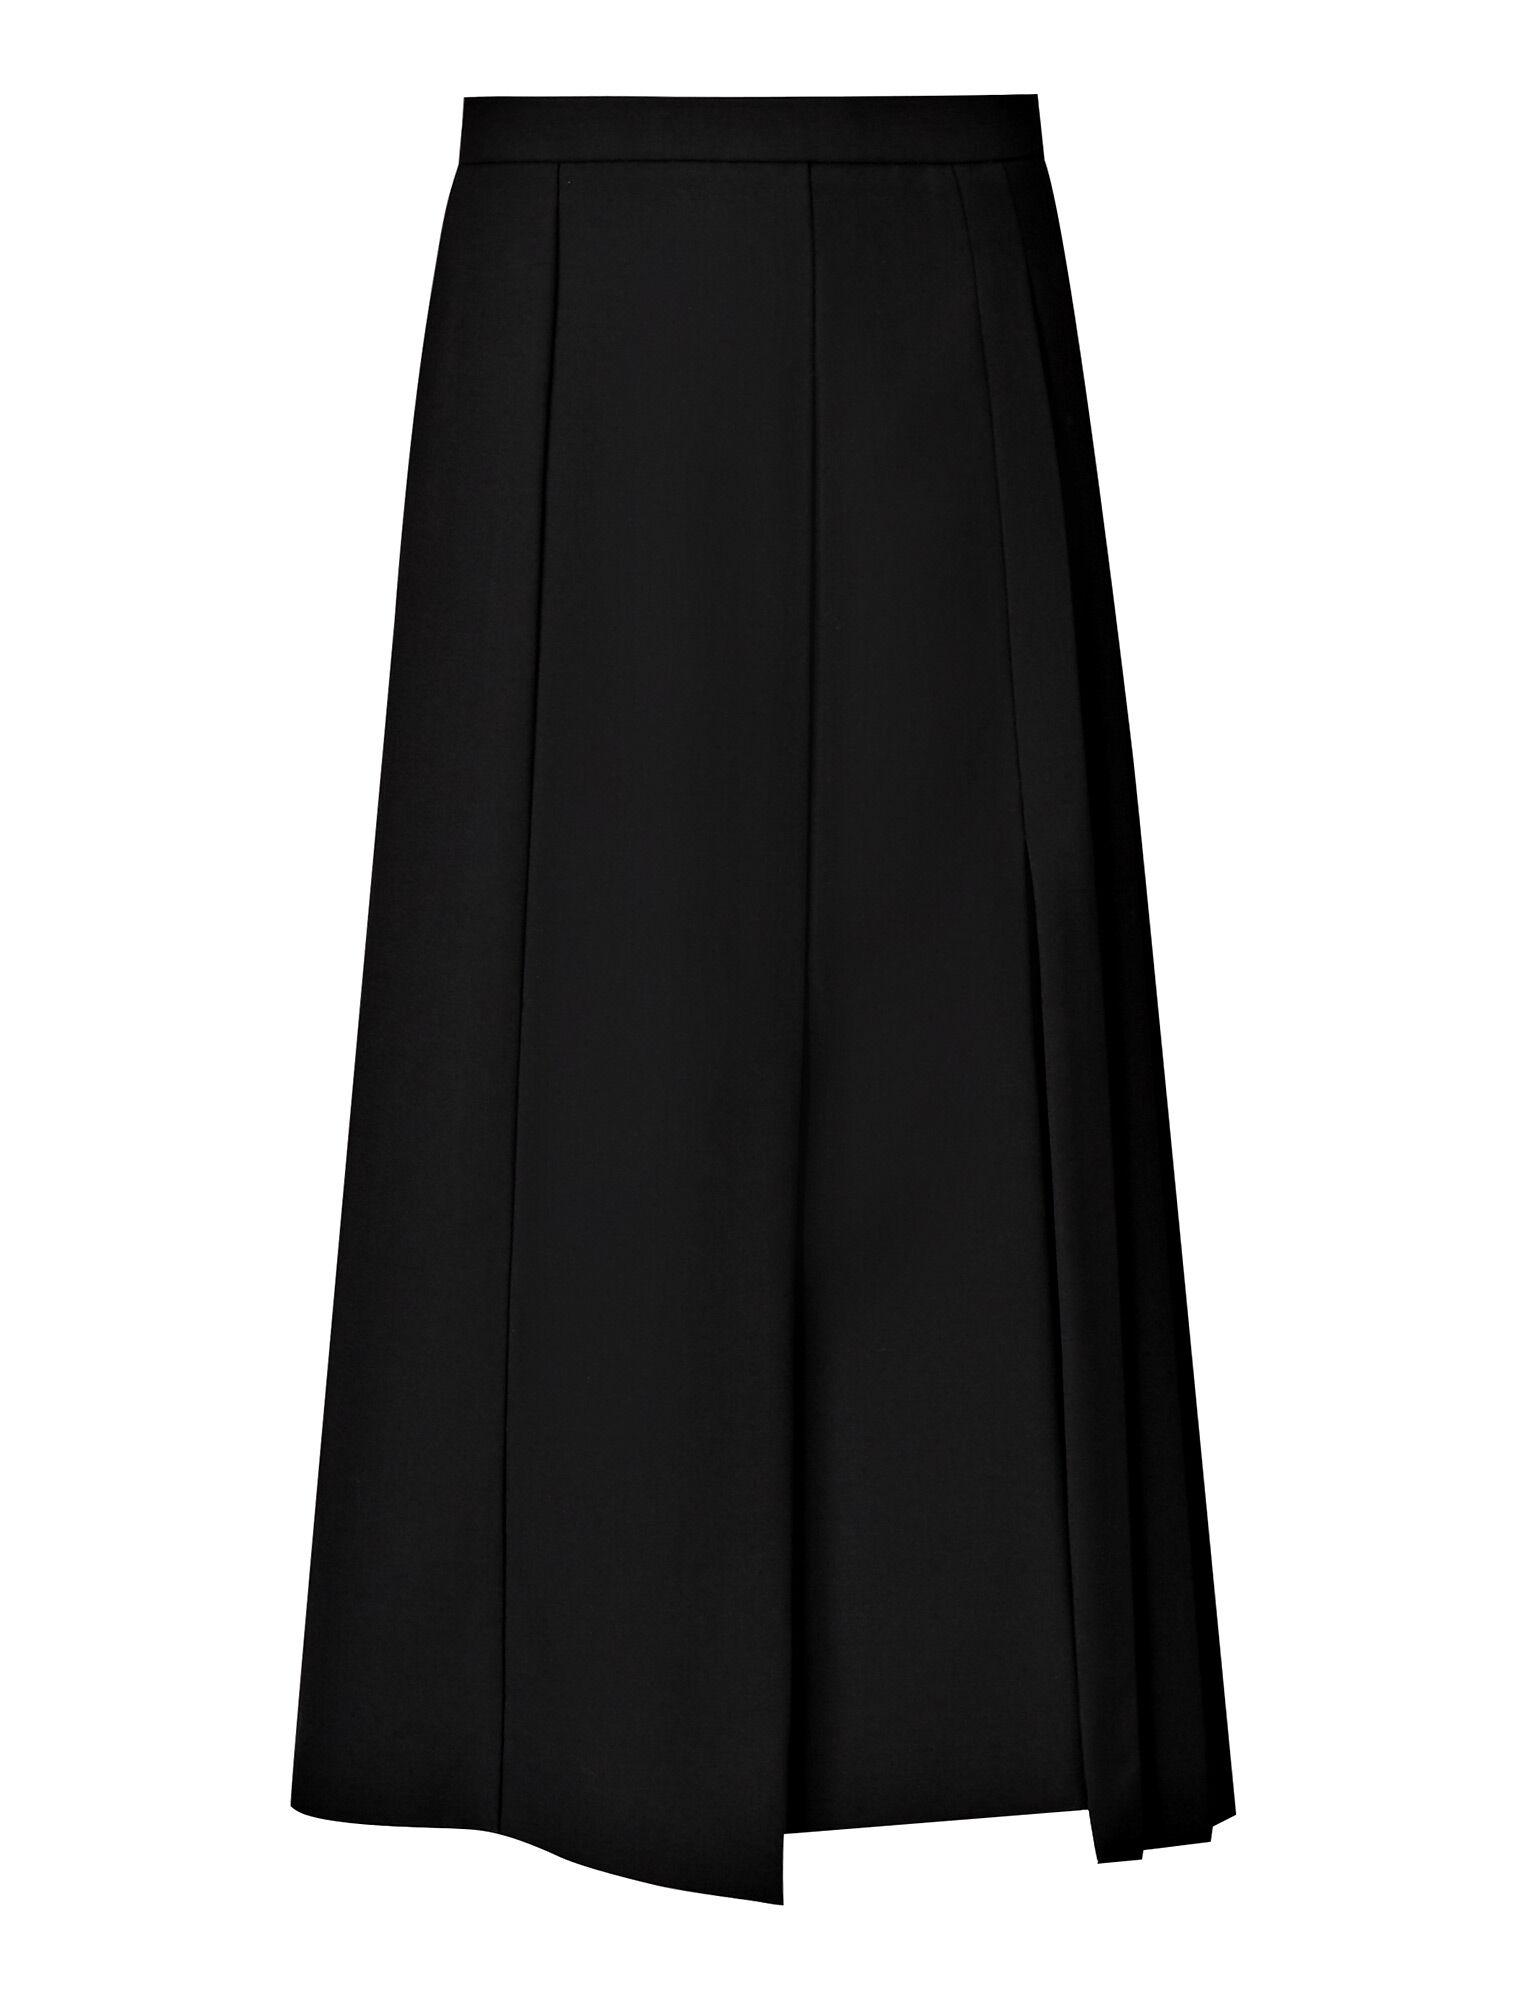 Joseph, Malvyn Wool Granite Skirt, in BLACK